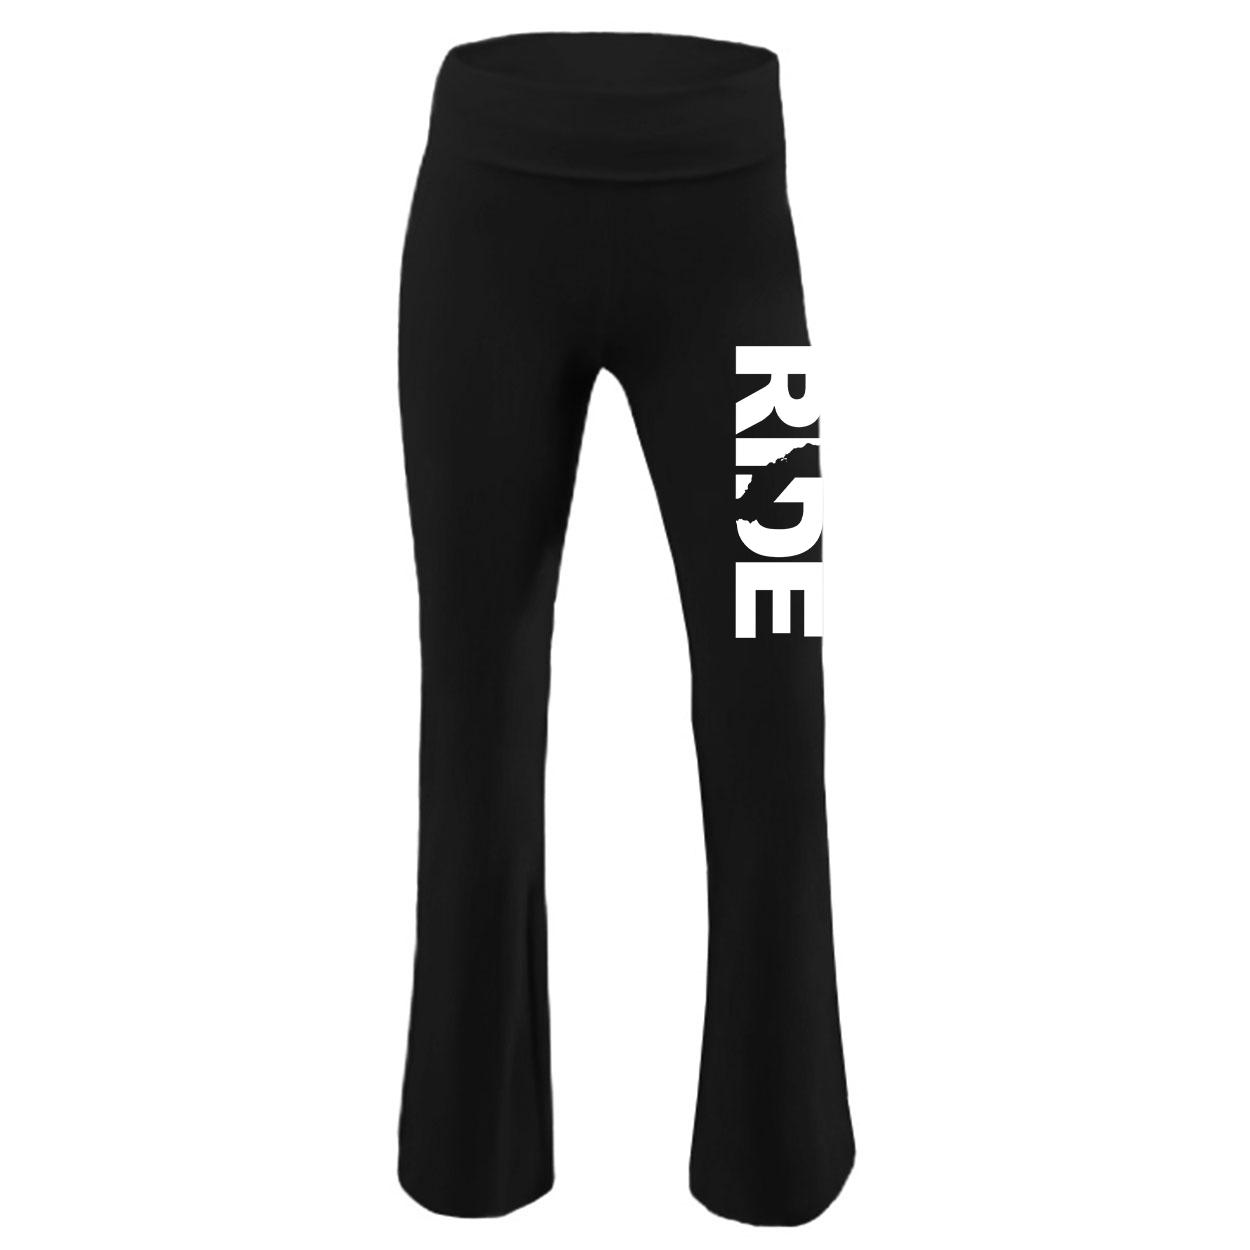 Ride California Classic Youth Girls Yoga Pants Black (White Logo)